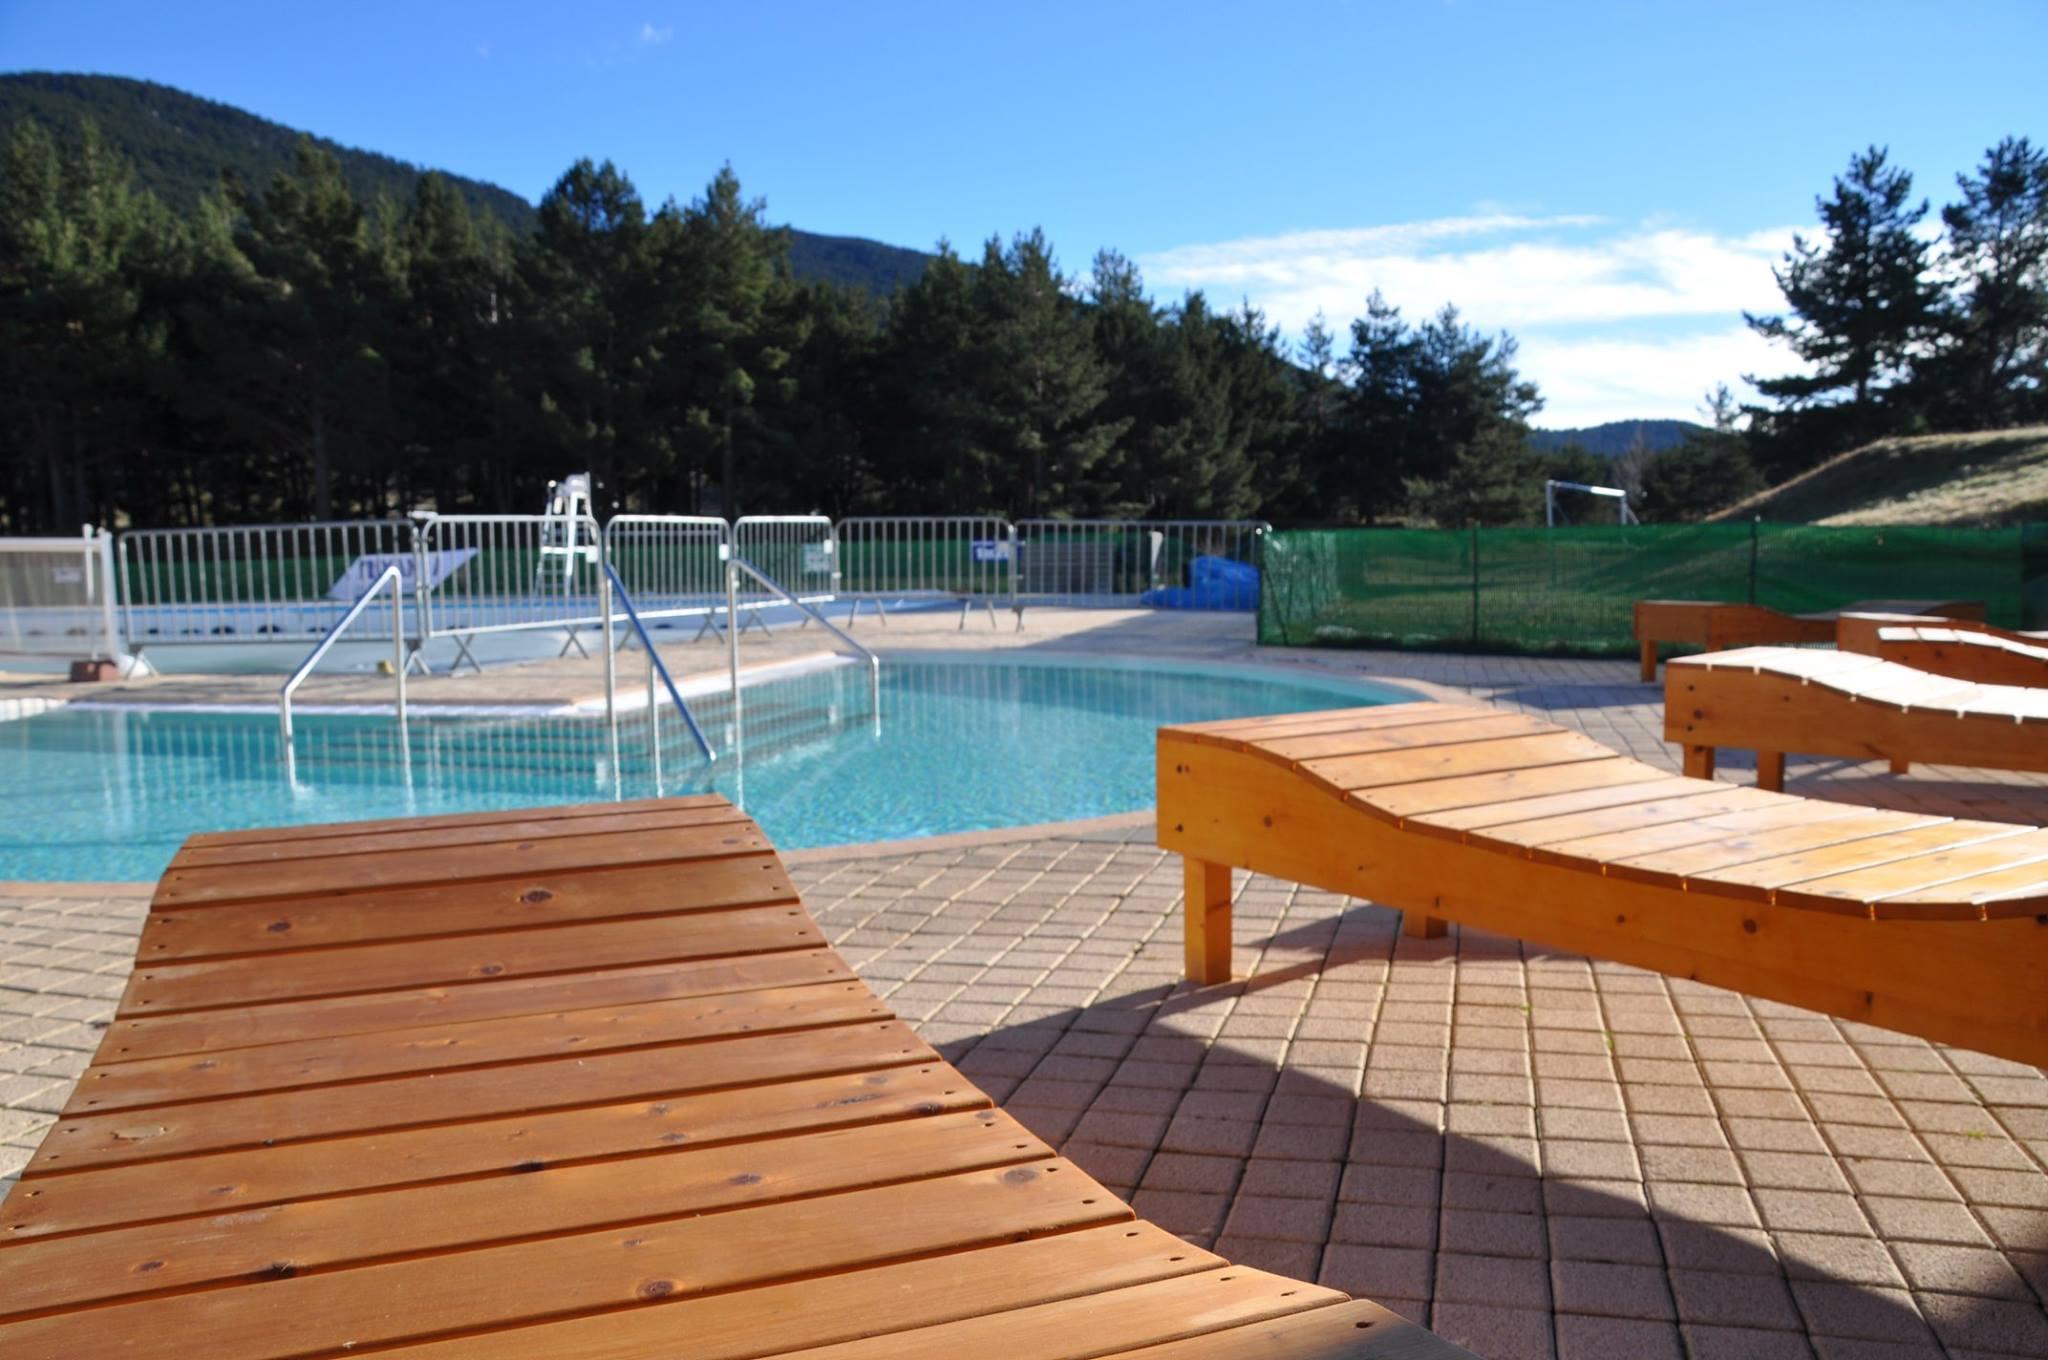 Bains chauds sauna piscine et hammam de matemale for Piscine bien etre